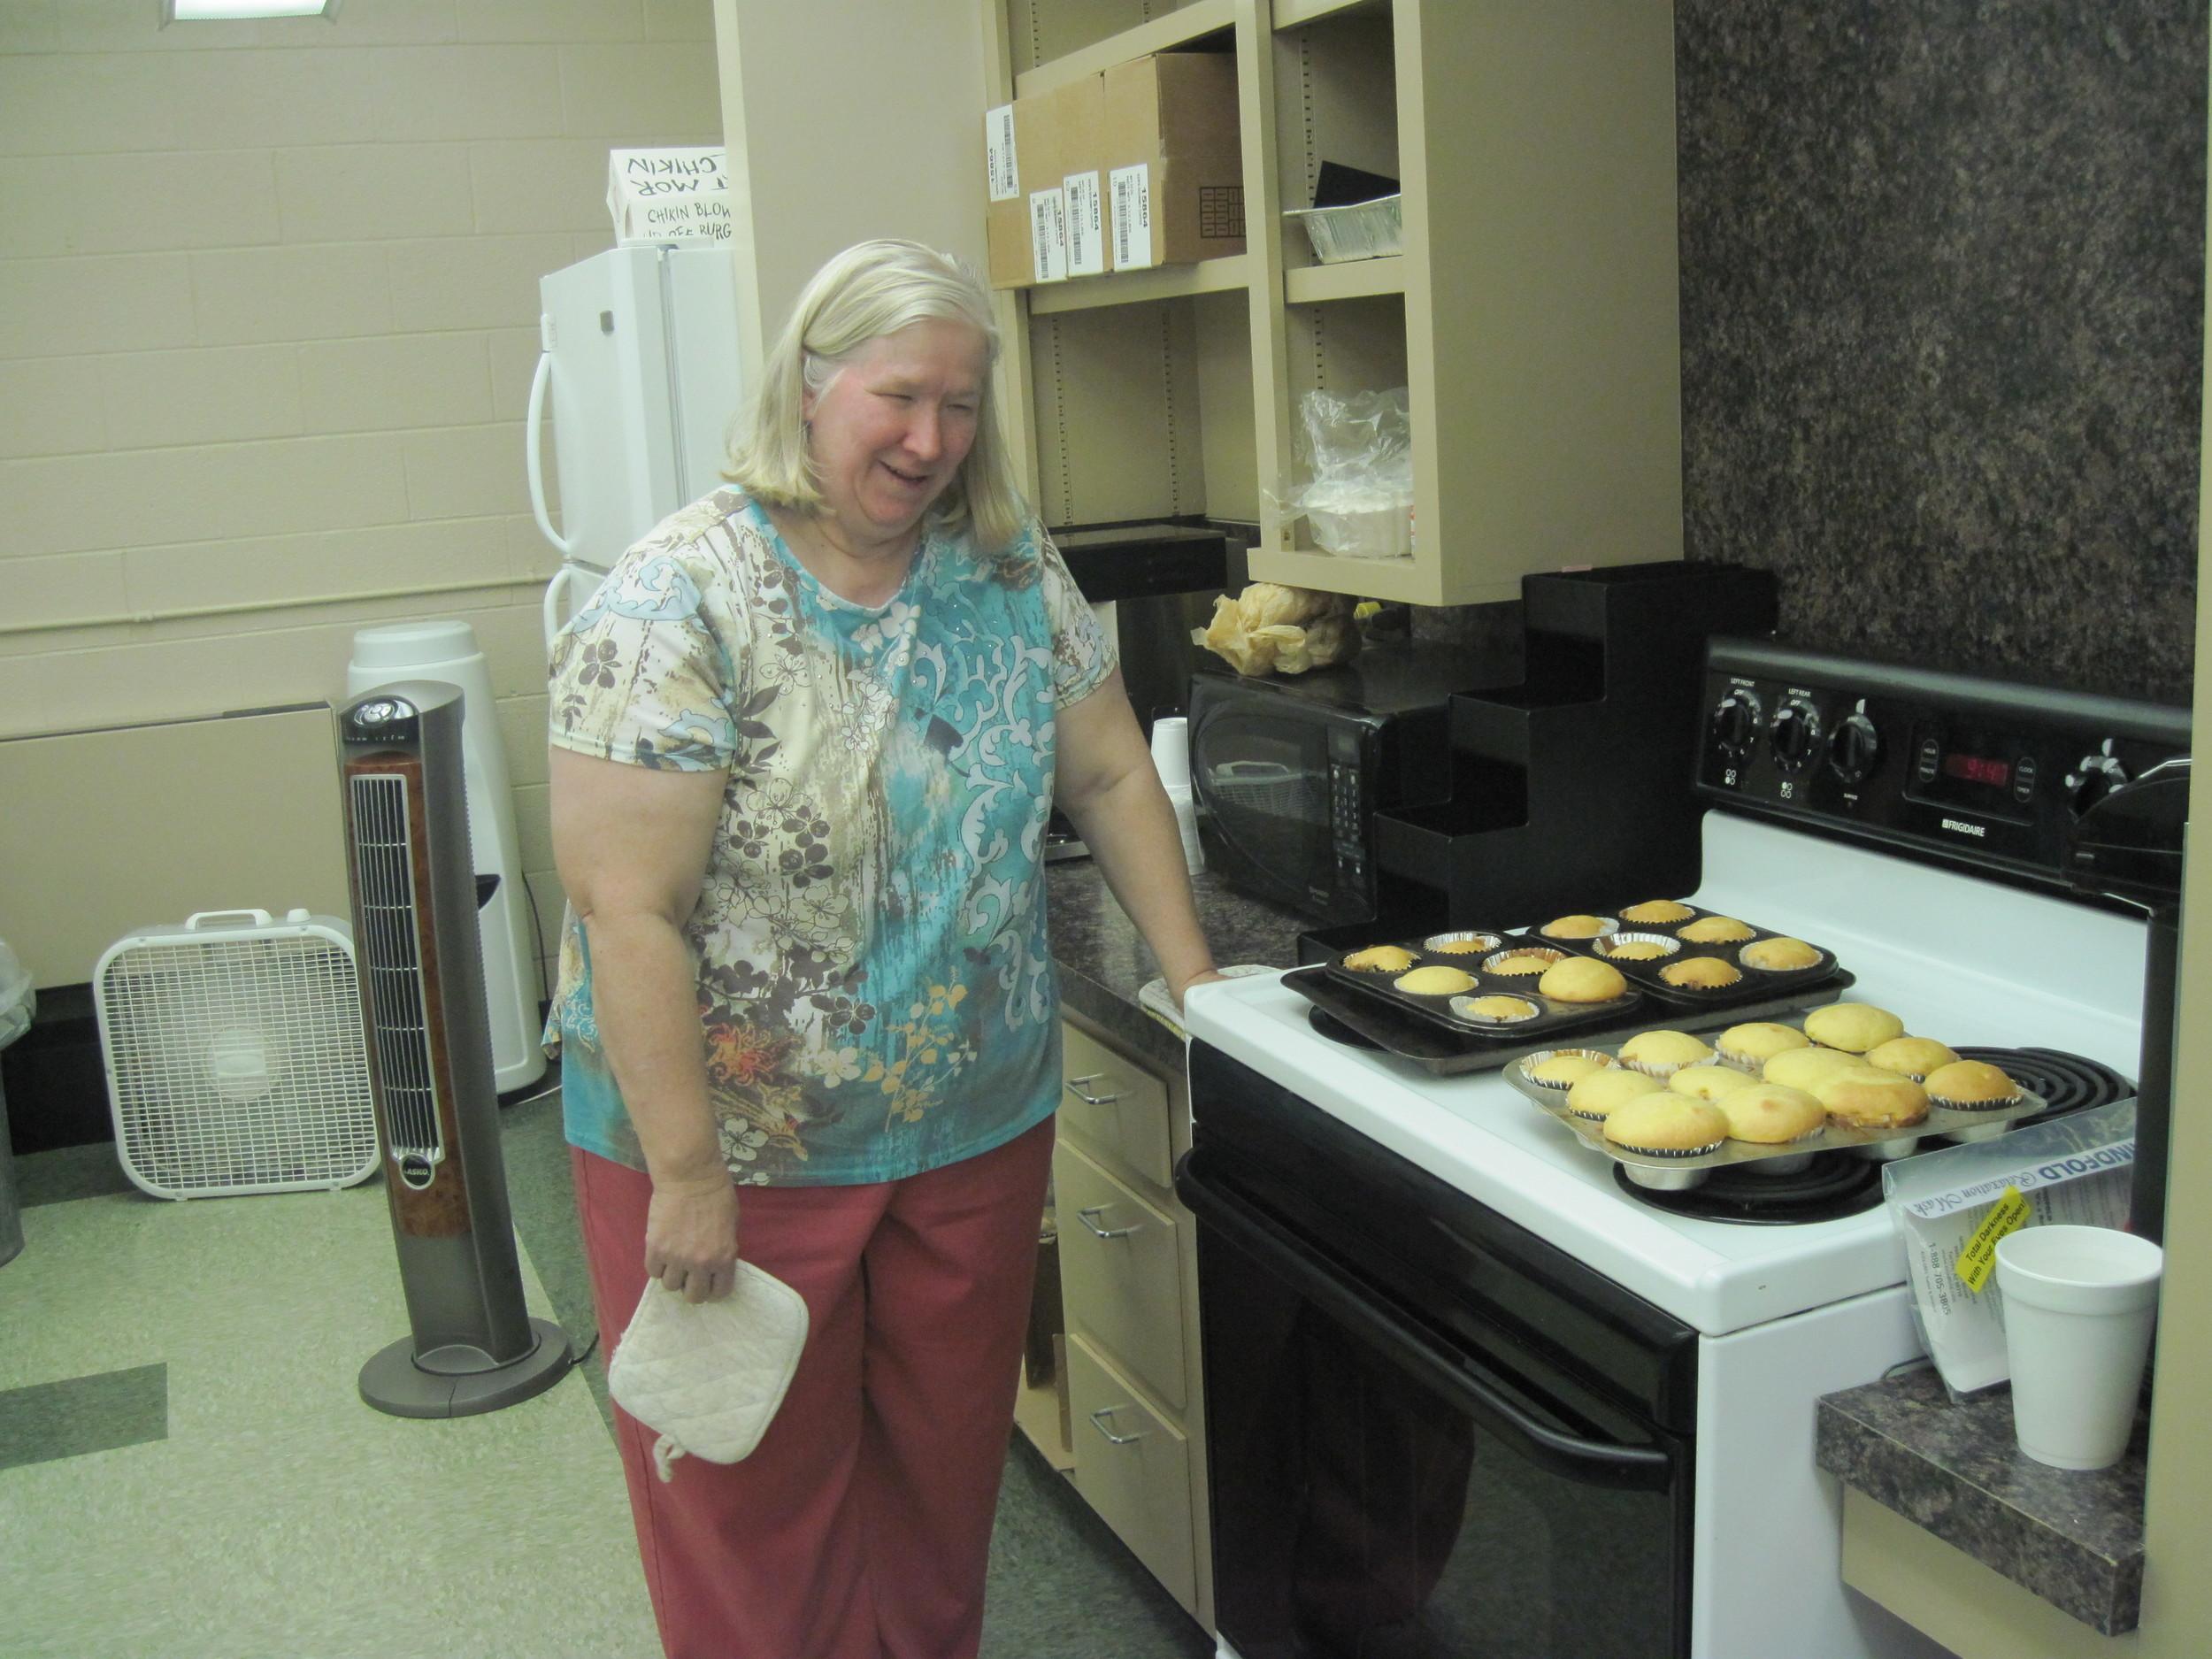 Zena assists in tecahing baking non-visually